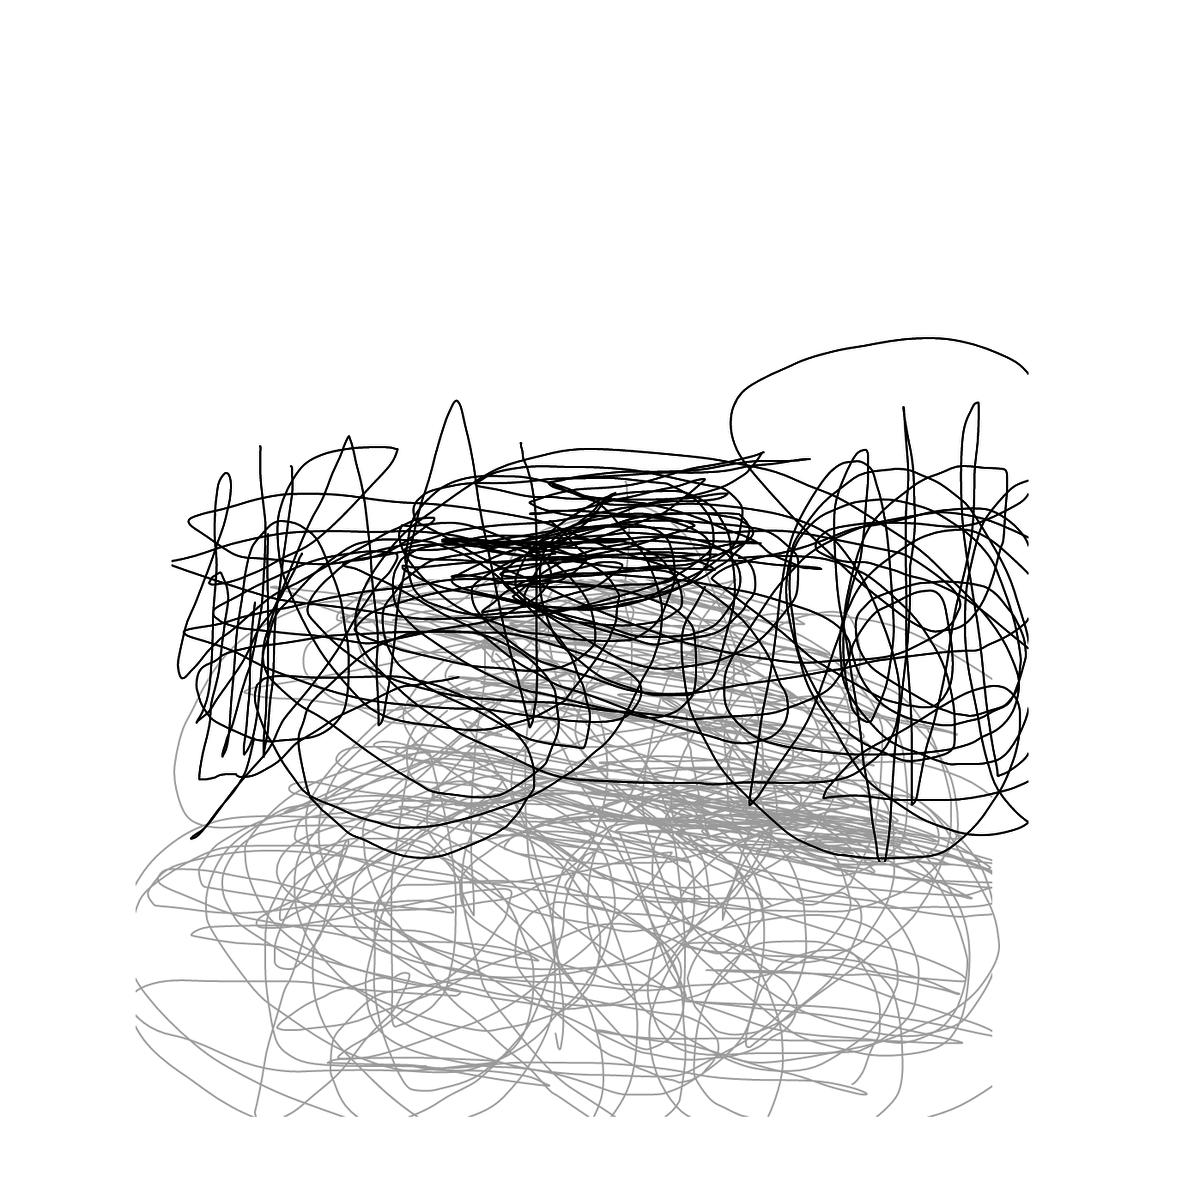 BAAAM drawing#1100 lat:51.7779884338378900lng: 19.4274272918701170